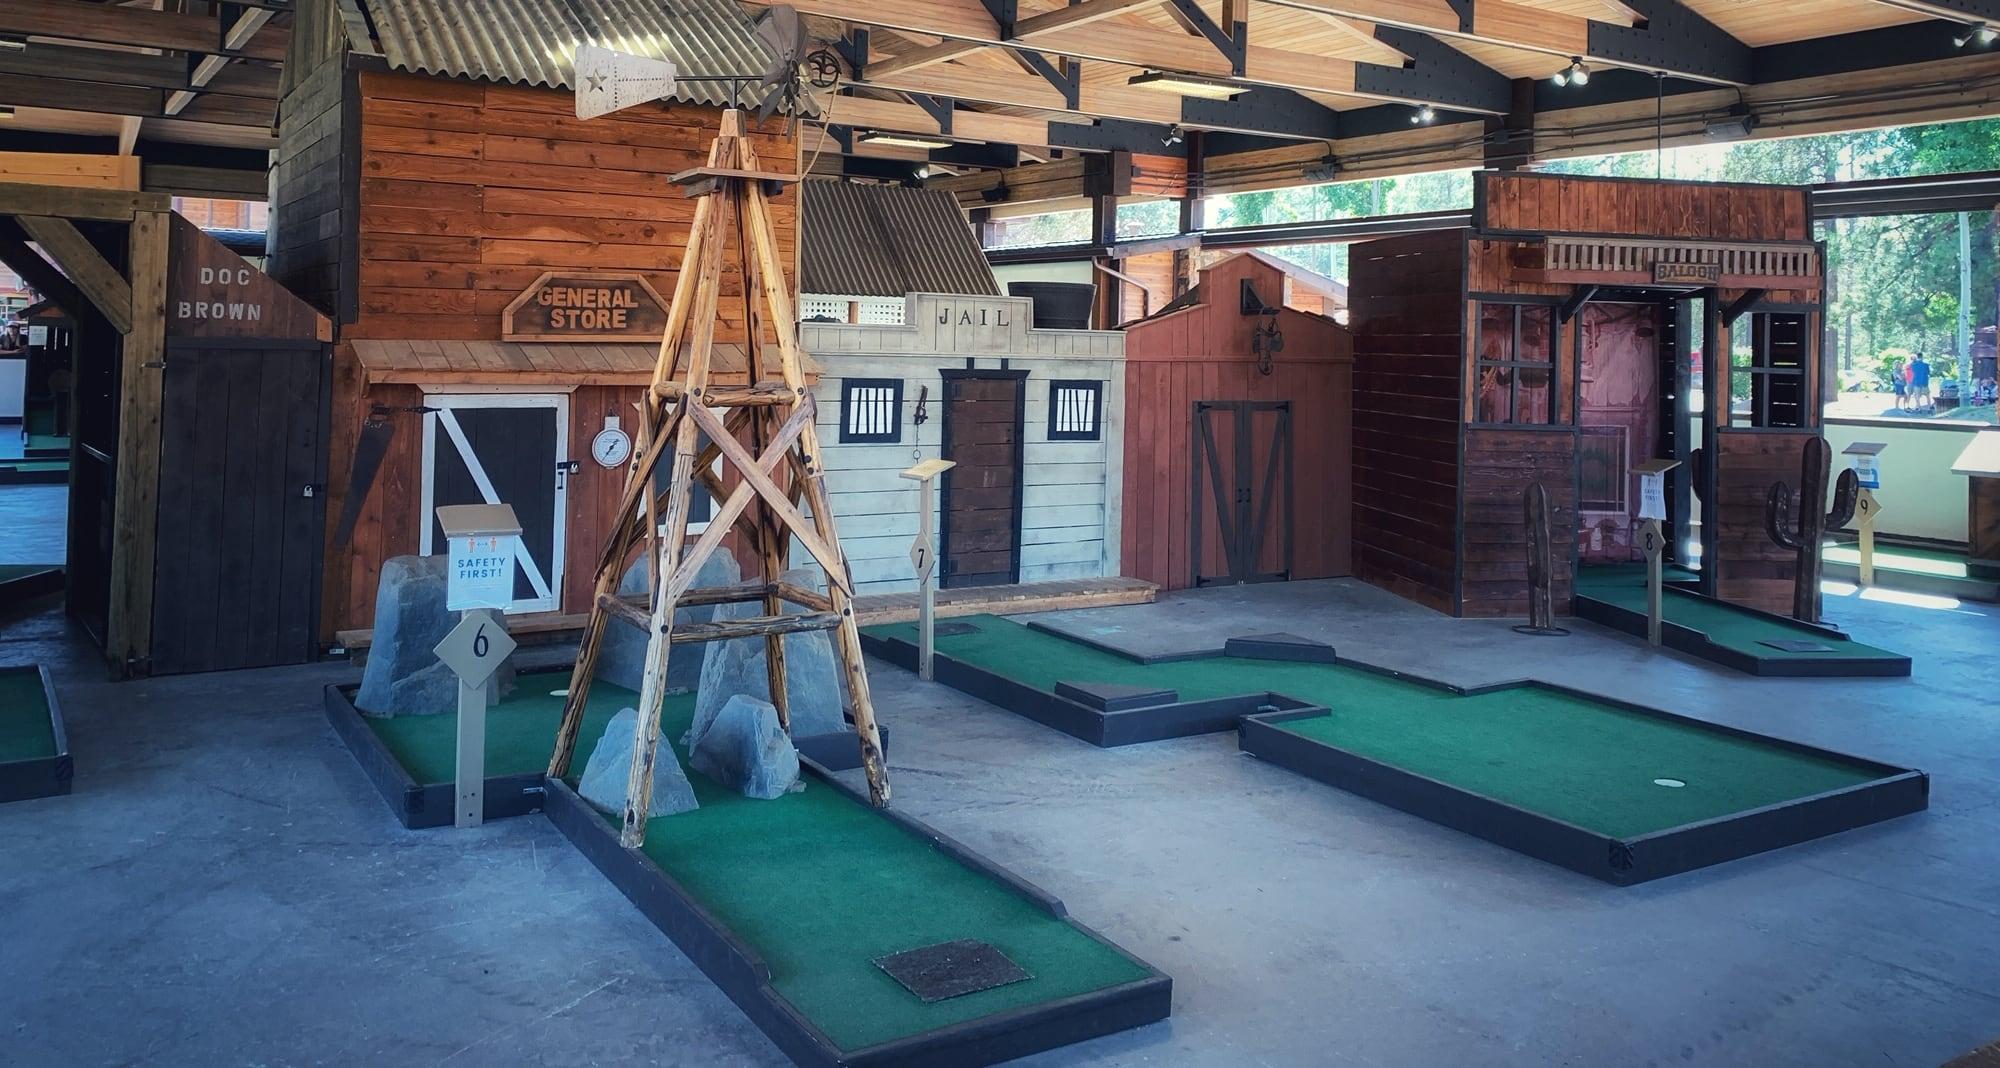 sunriver village putt putt golf